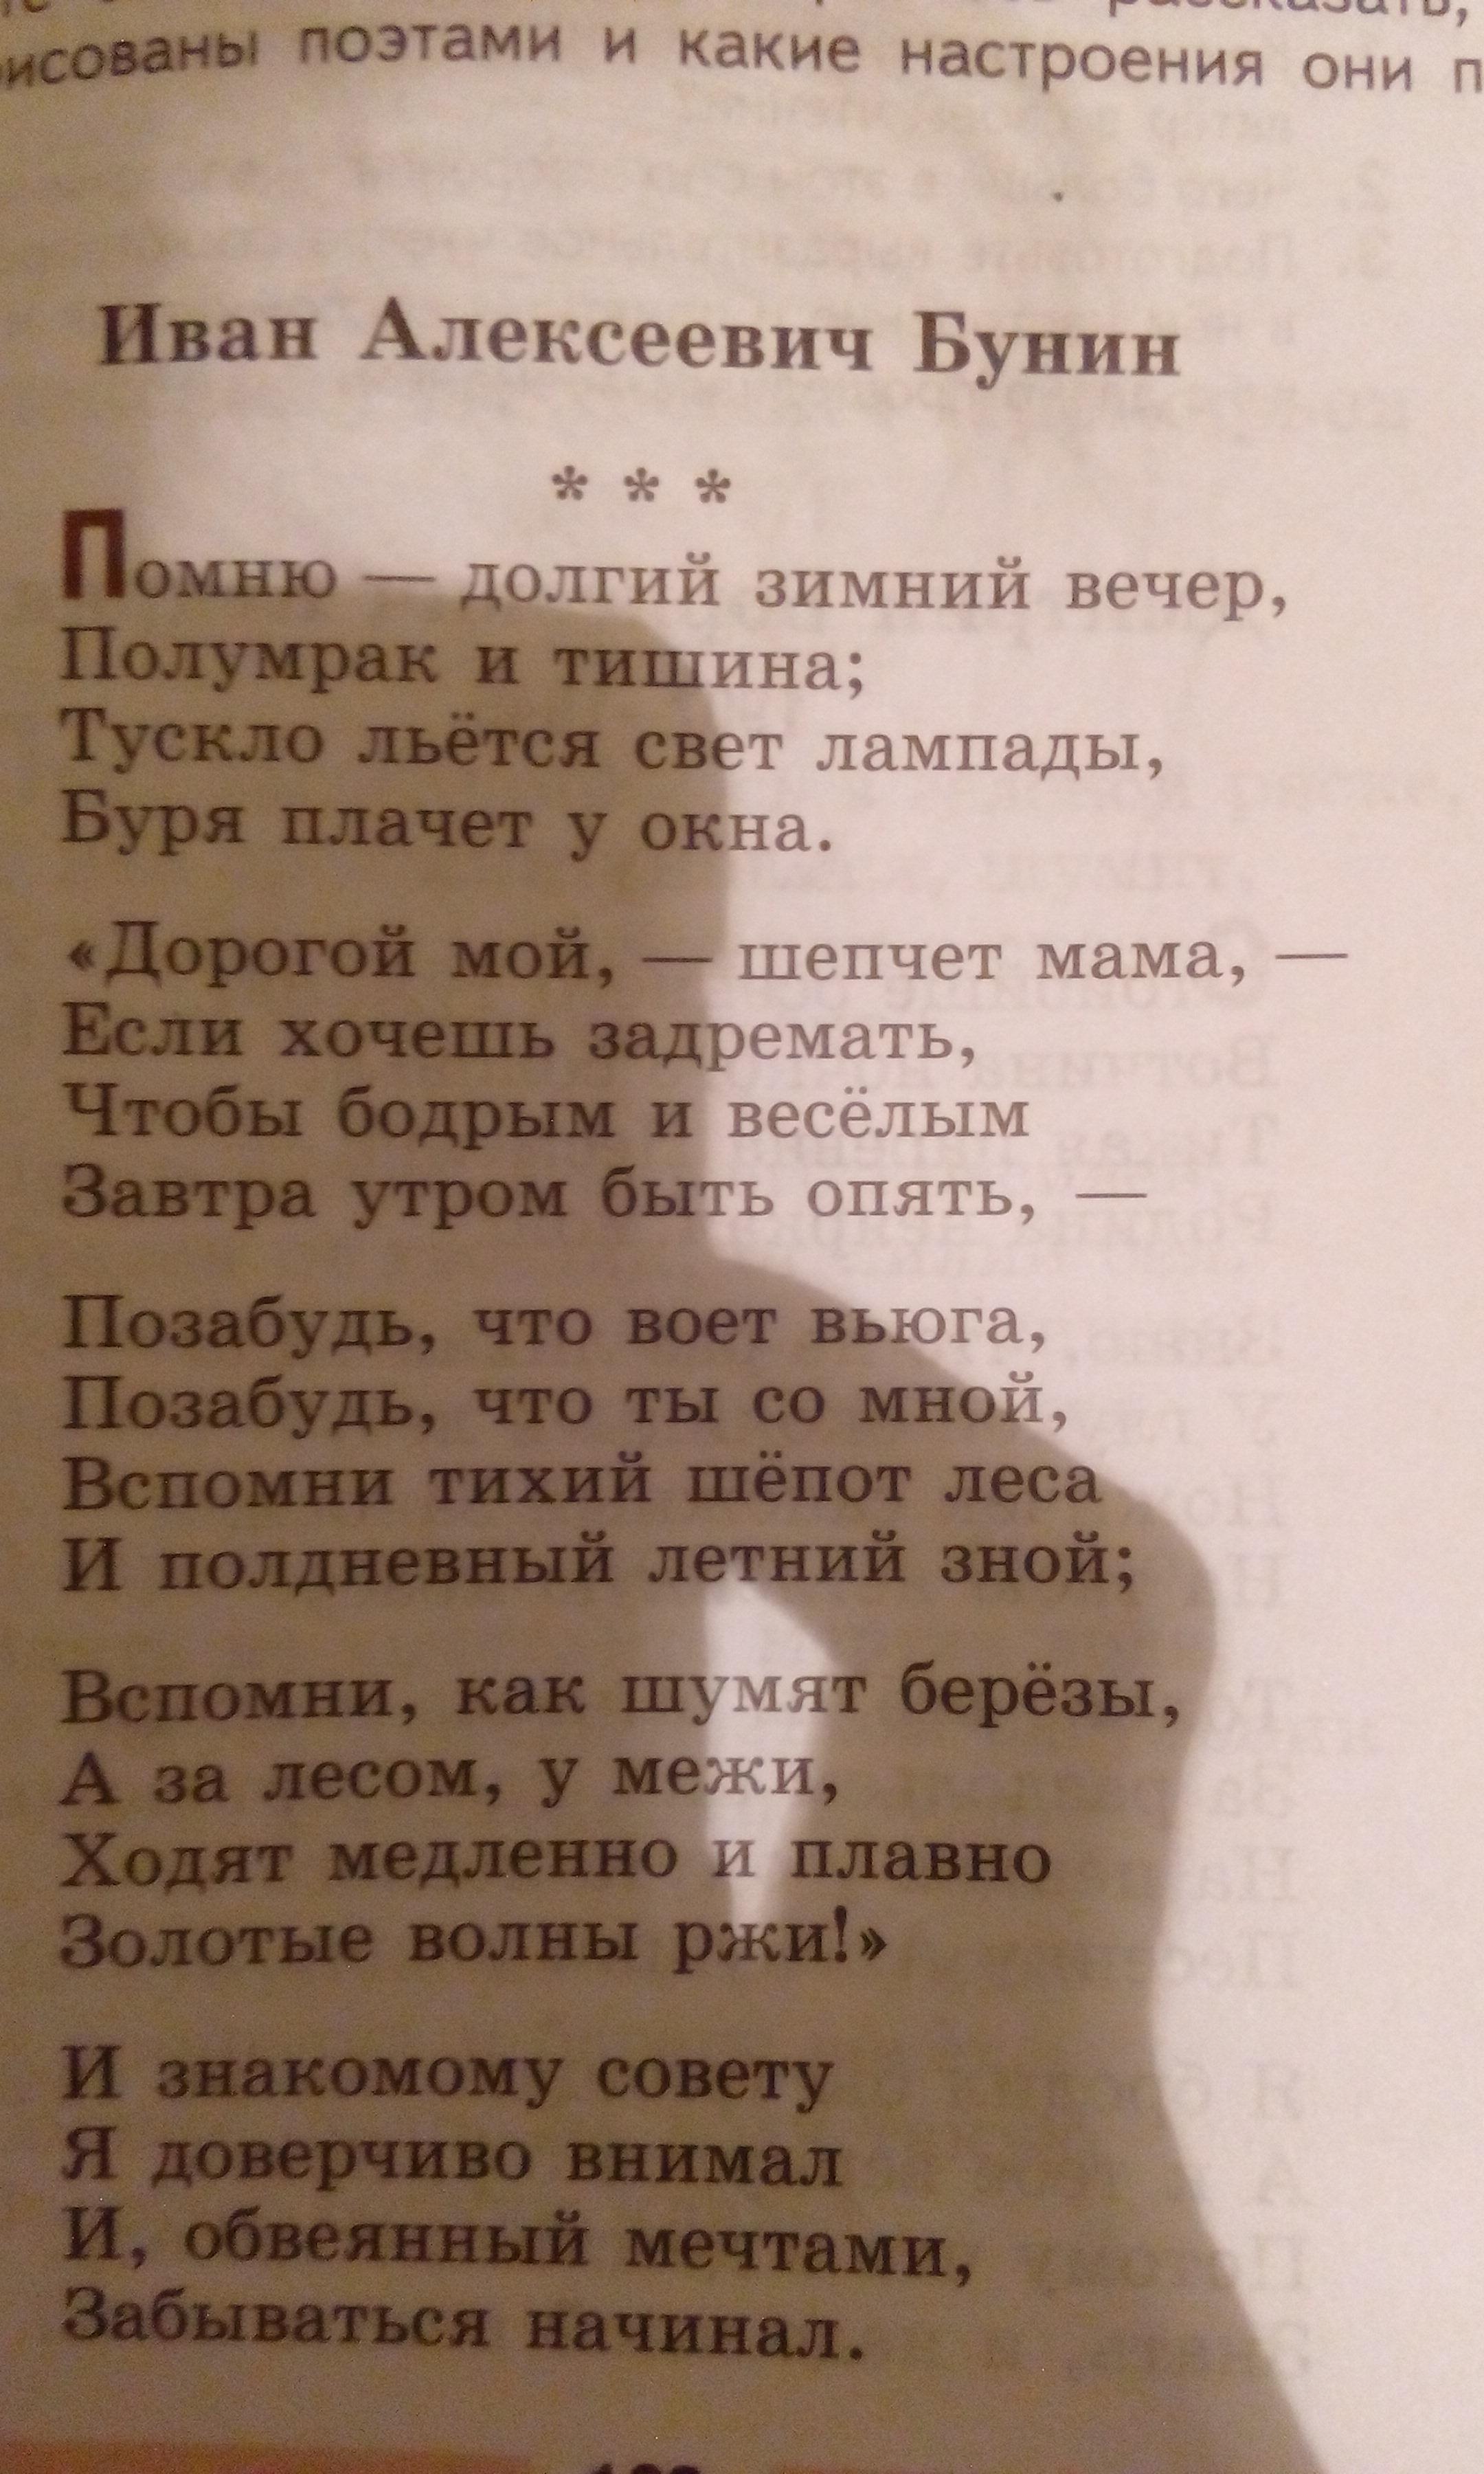 "Анализ стихотворения И.А.Бунина ""Помню-долгий зимний вечер"""